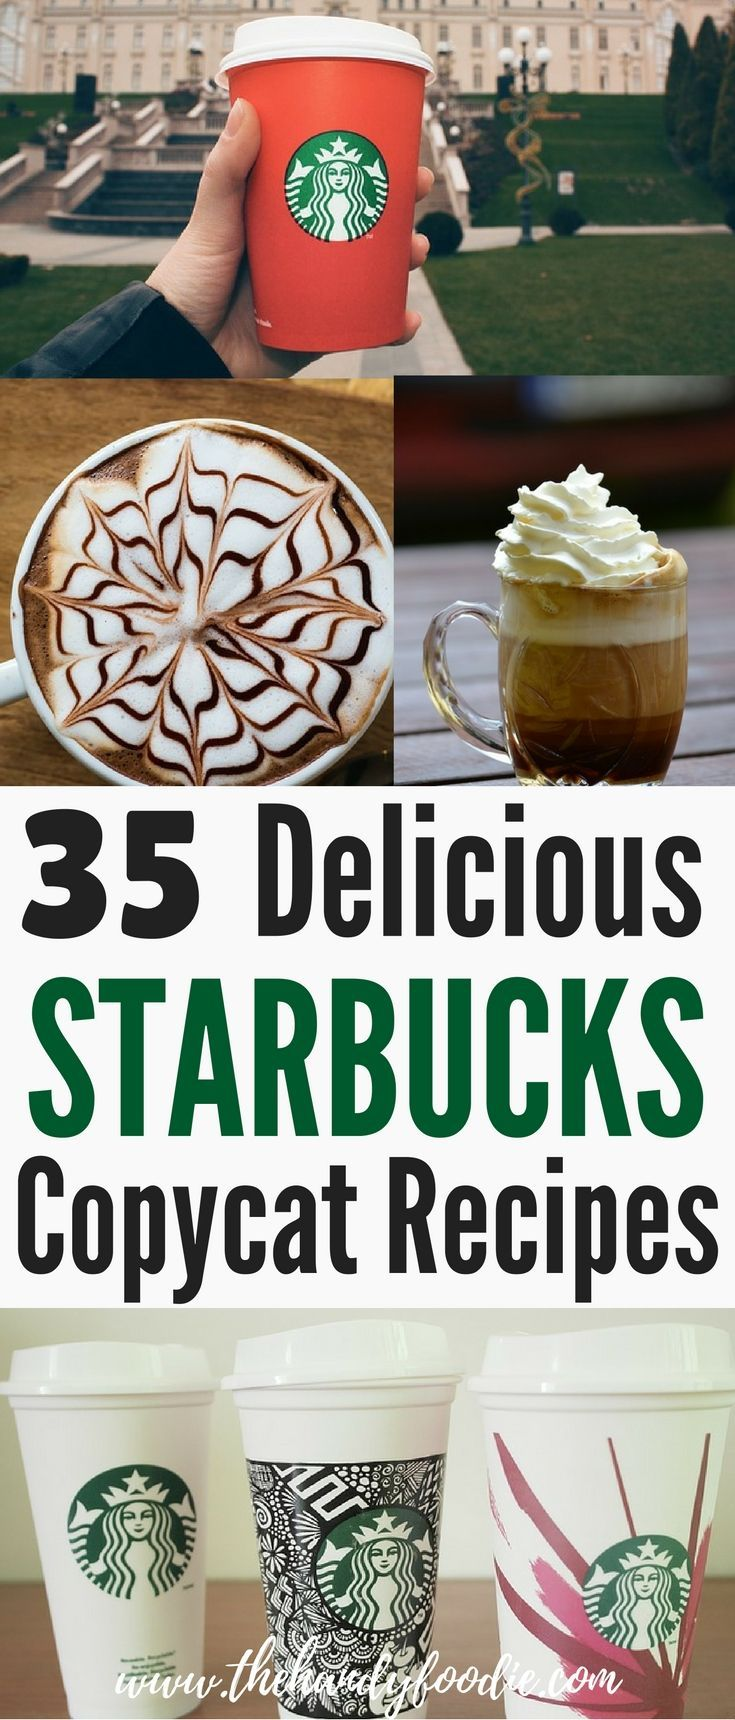 35 Delicious Starbucks Copycat Recipes Starbucks